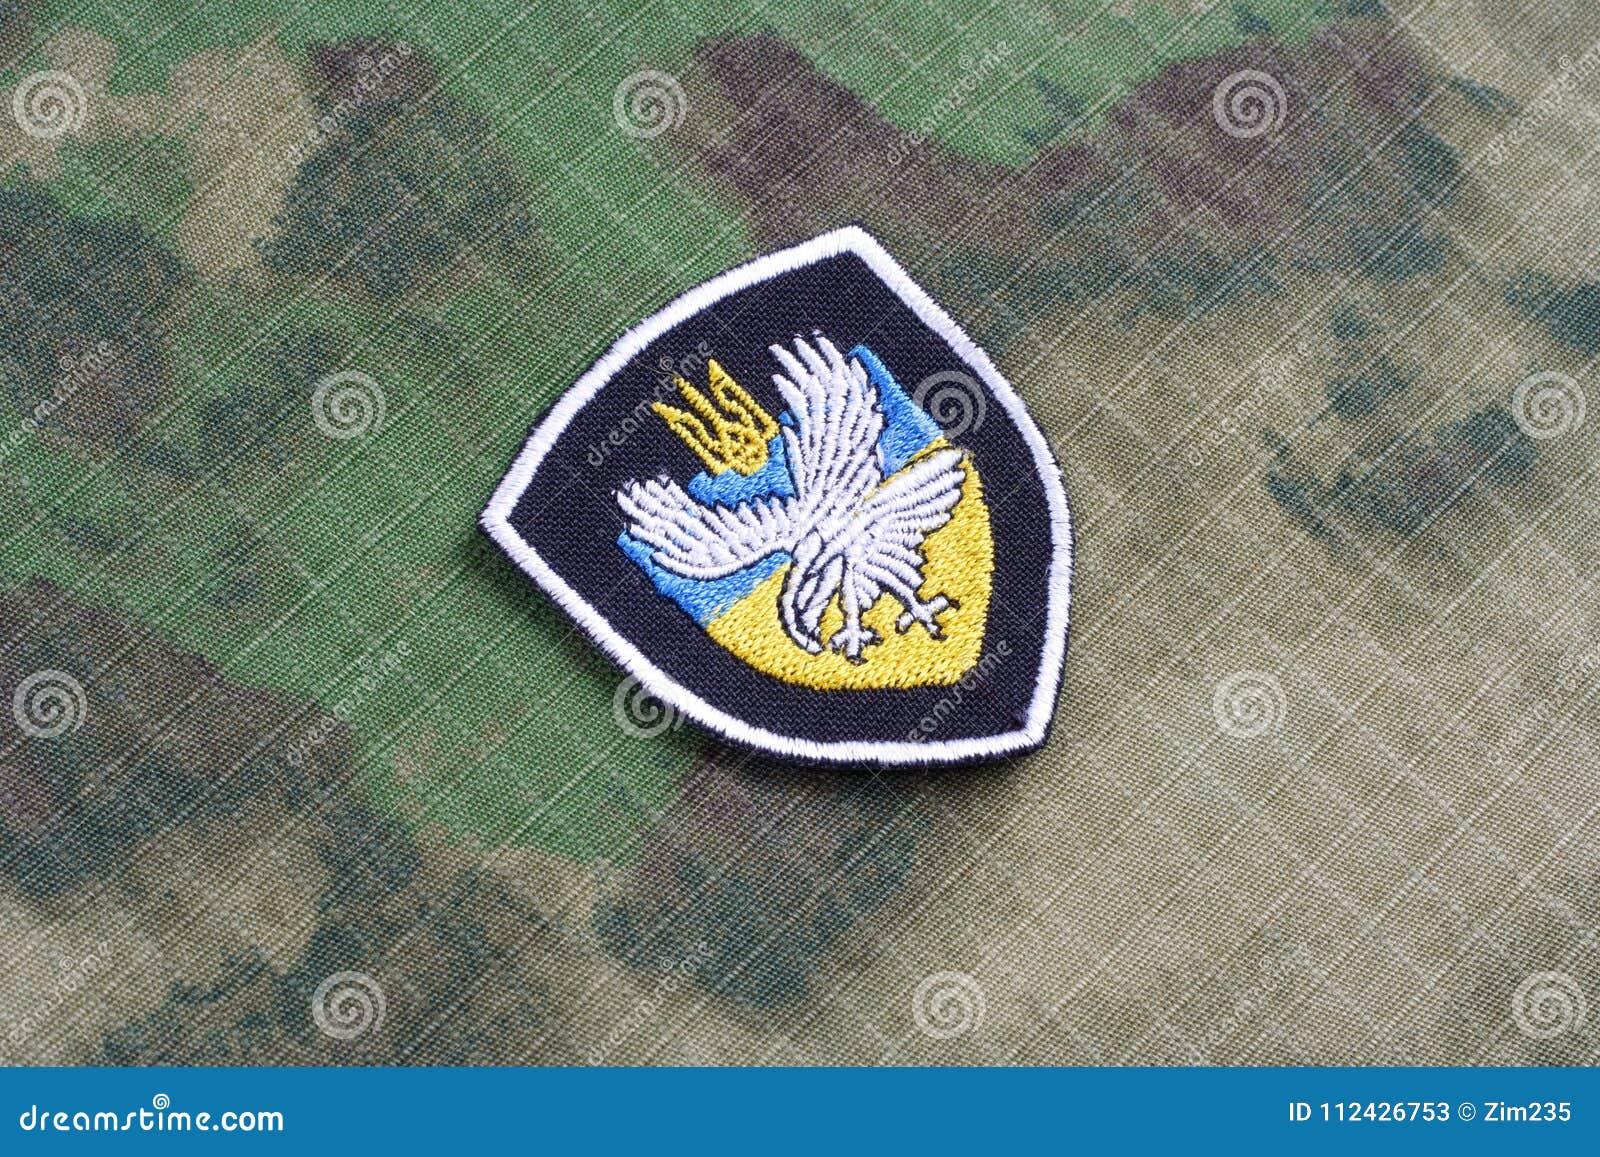 KYIV, UKRAINE - July, 16, 2015. Ministry of Internal Affairs Ukraine uniform badge